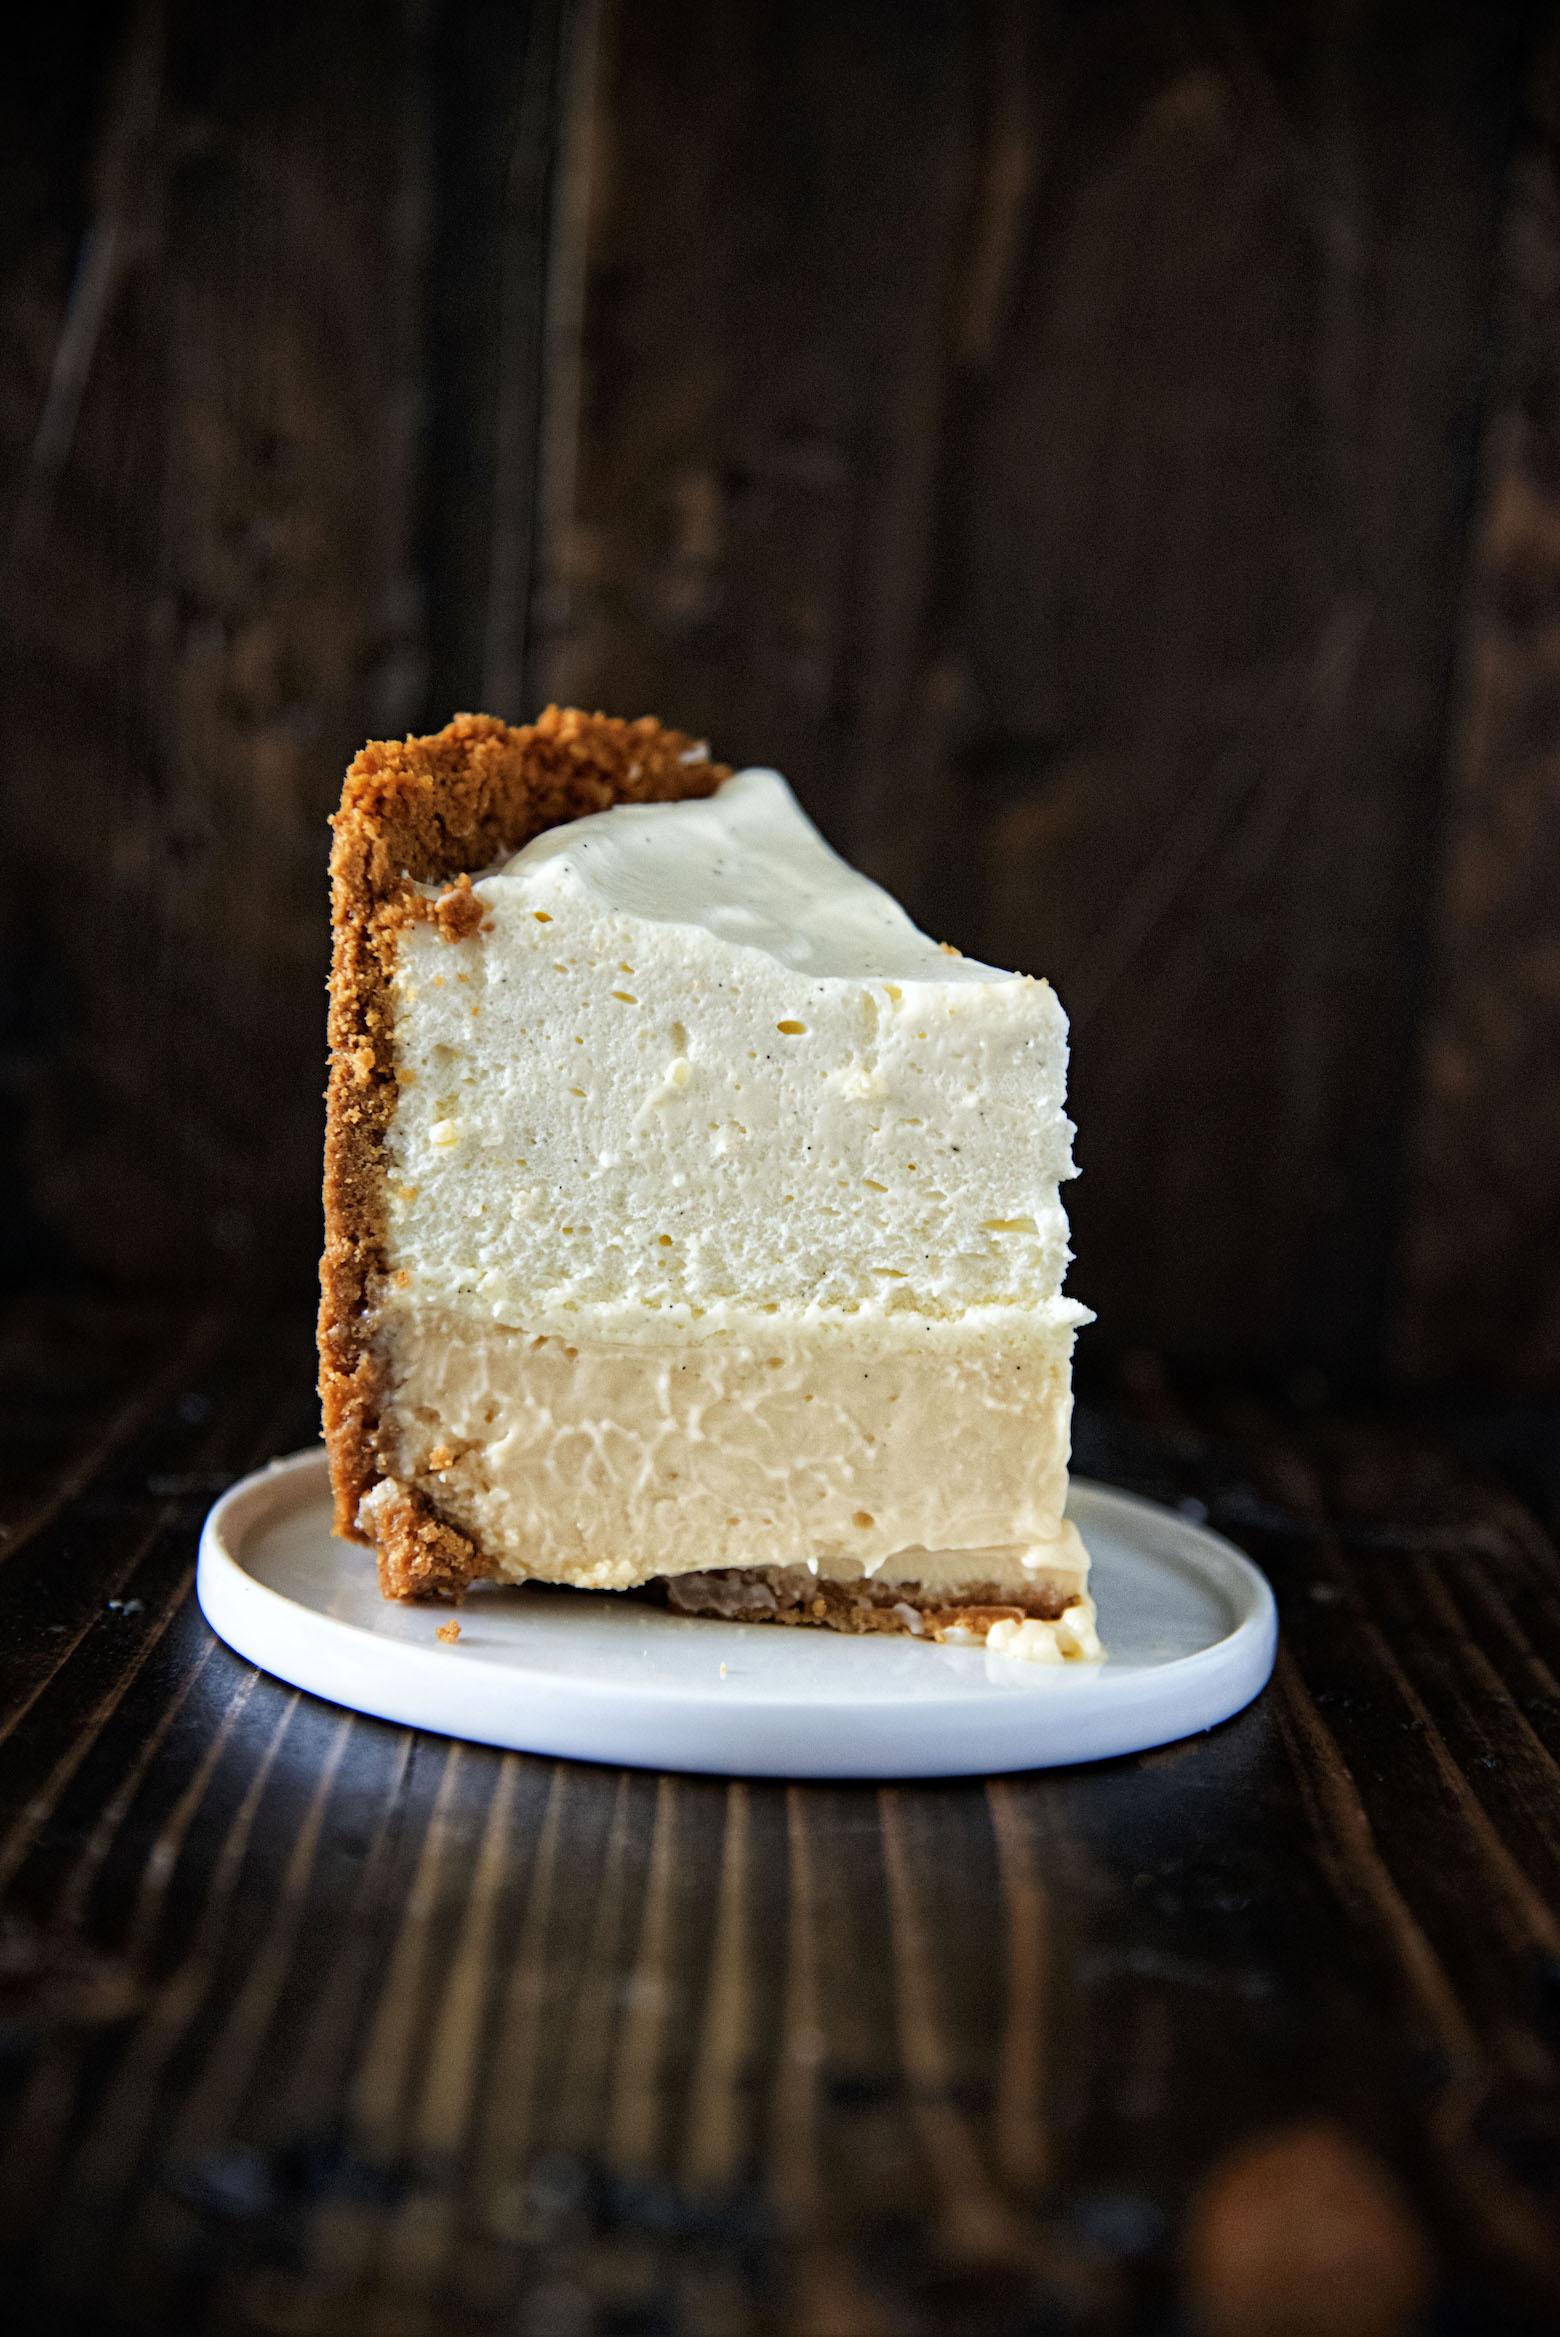 Slice of Mile High Key Lime Pie